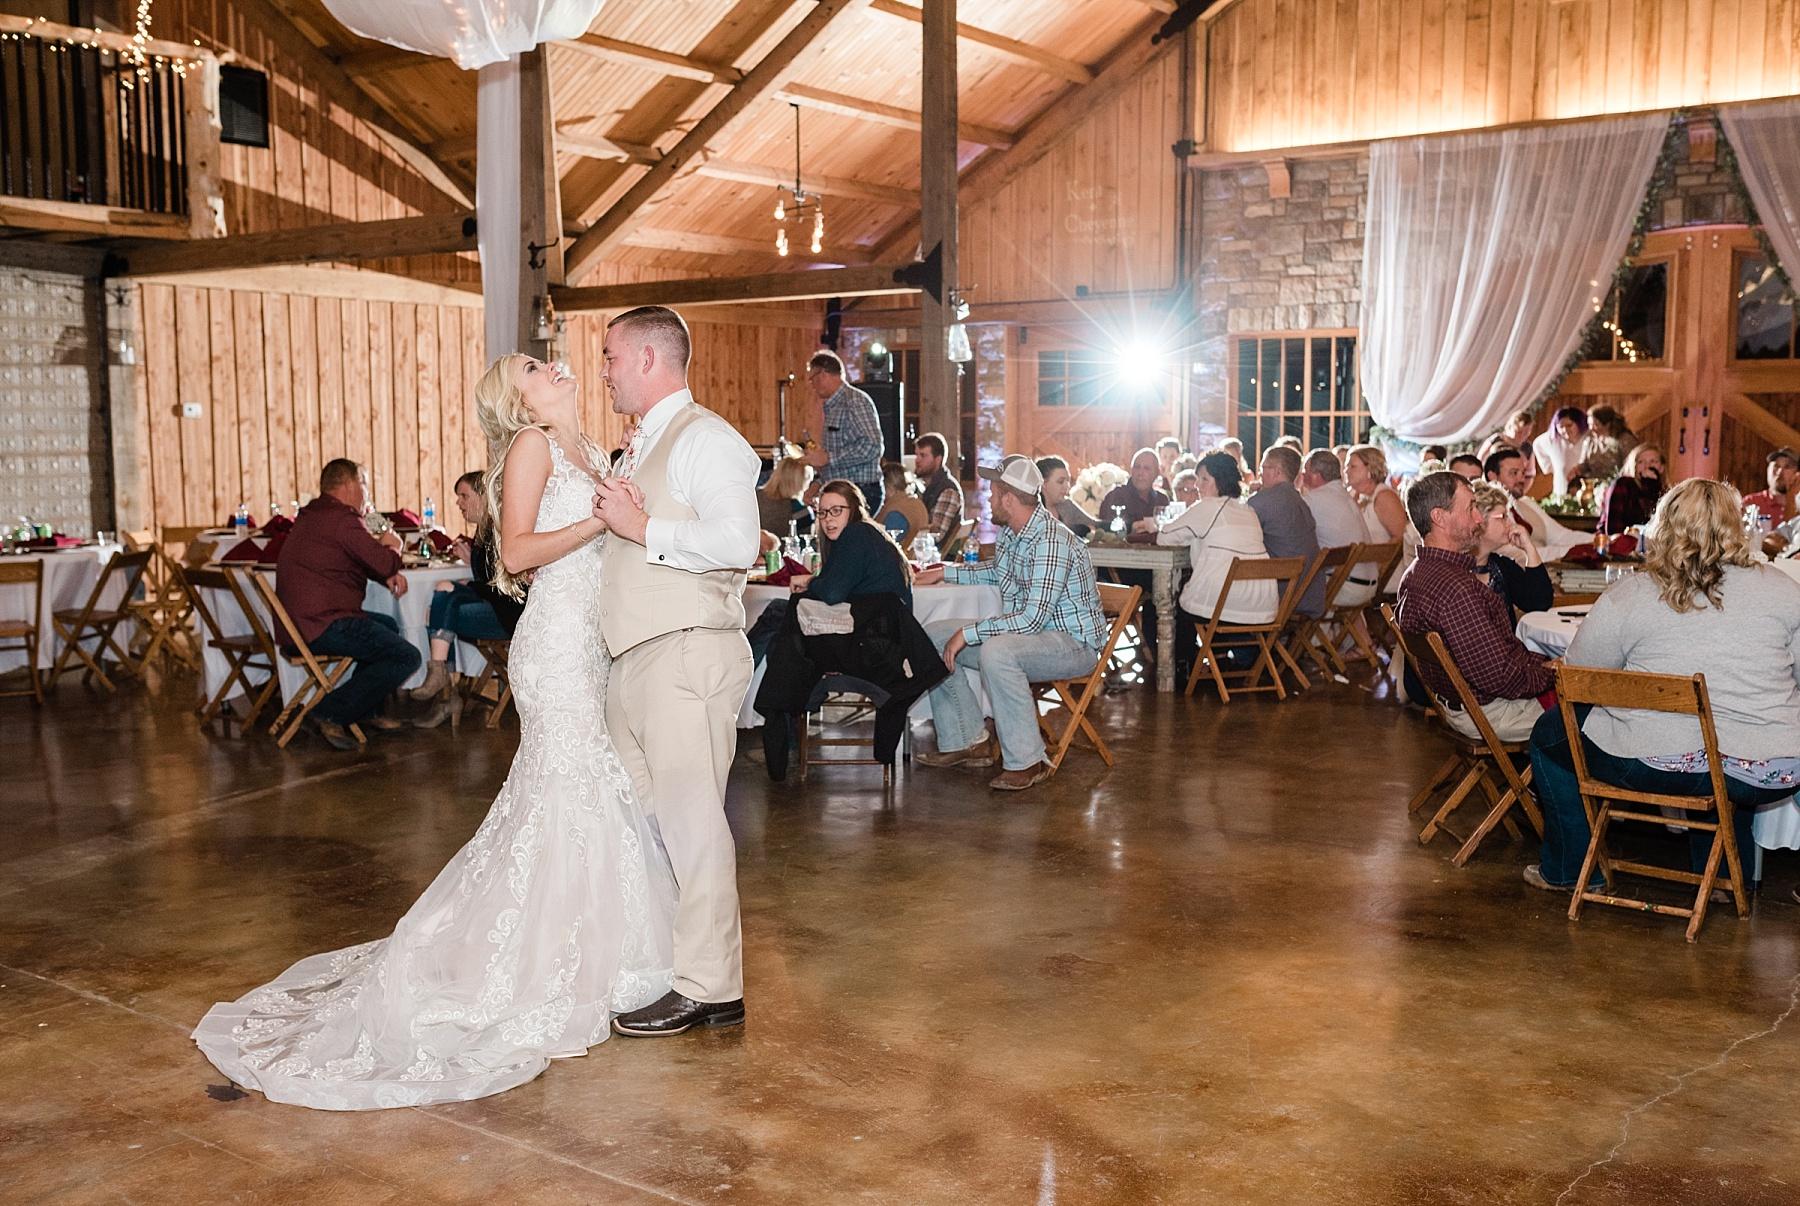 Lakeside Wedding in Fall at Mighty Oak Lodge by Misouri Wedding Photographer Kelsi Kliethermes Photography_0006.jpg